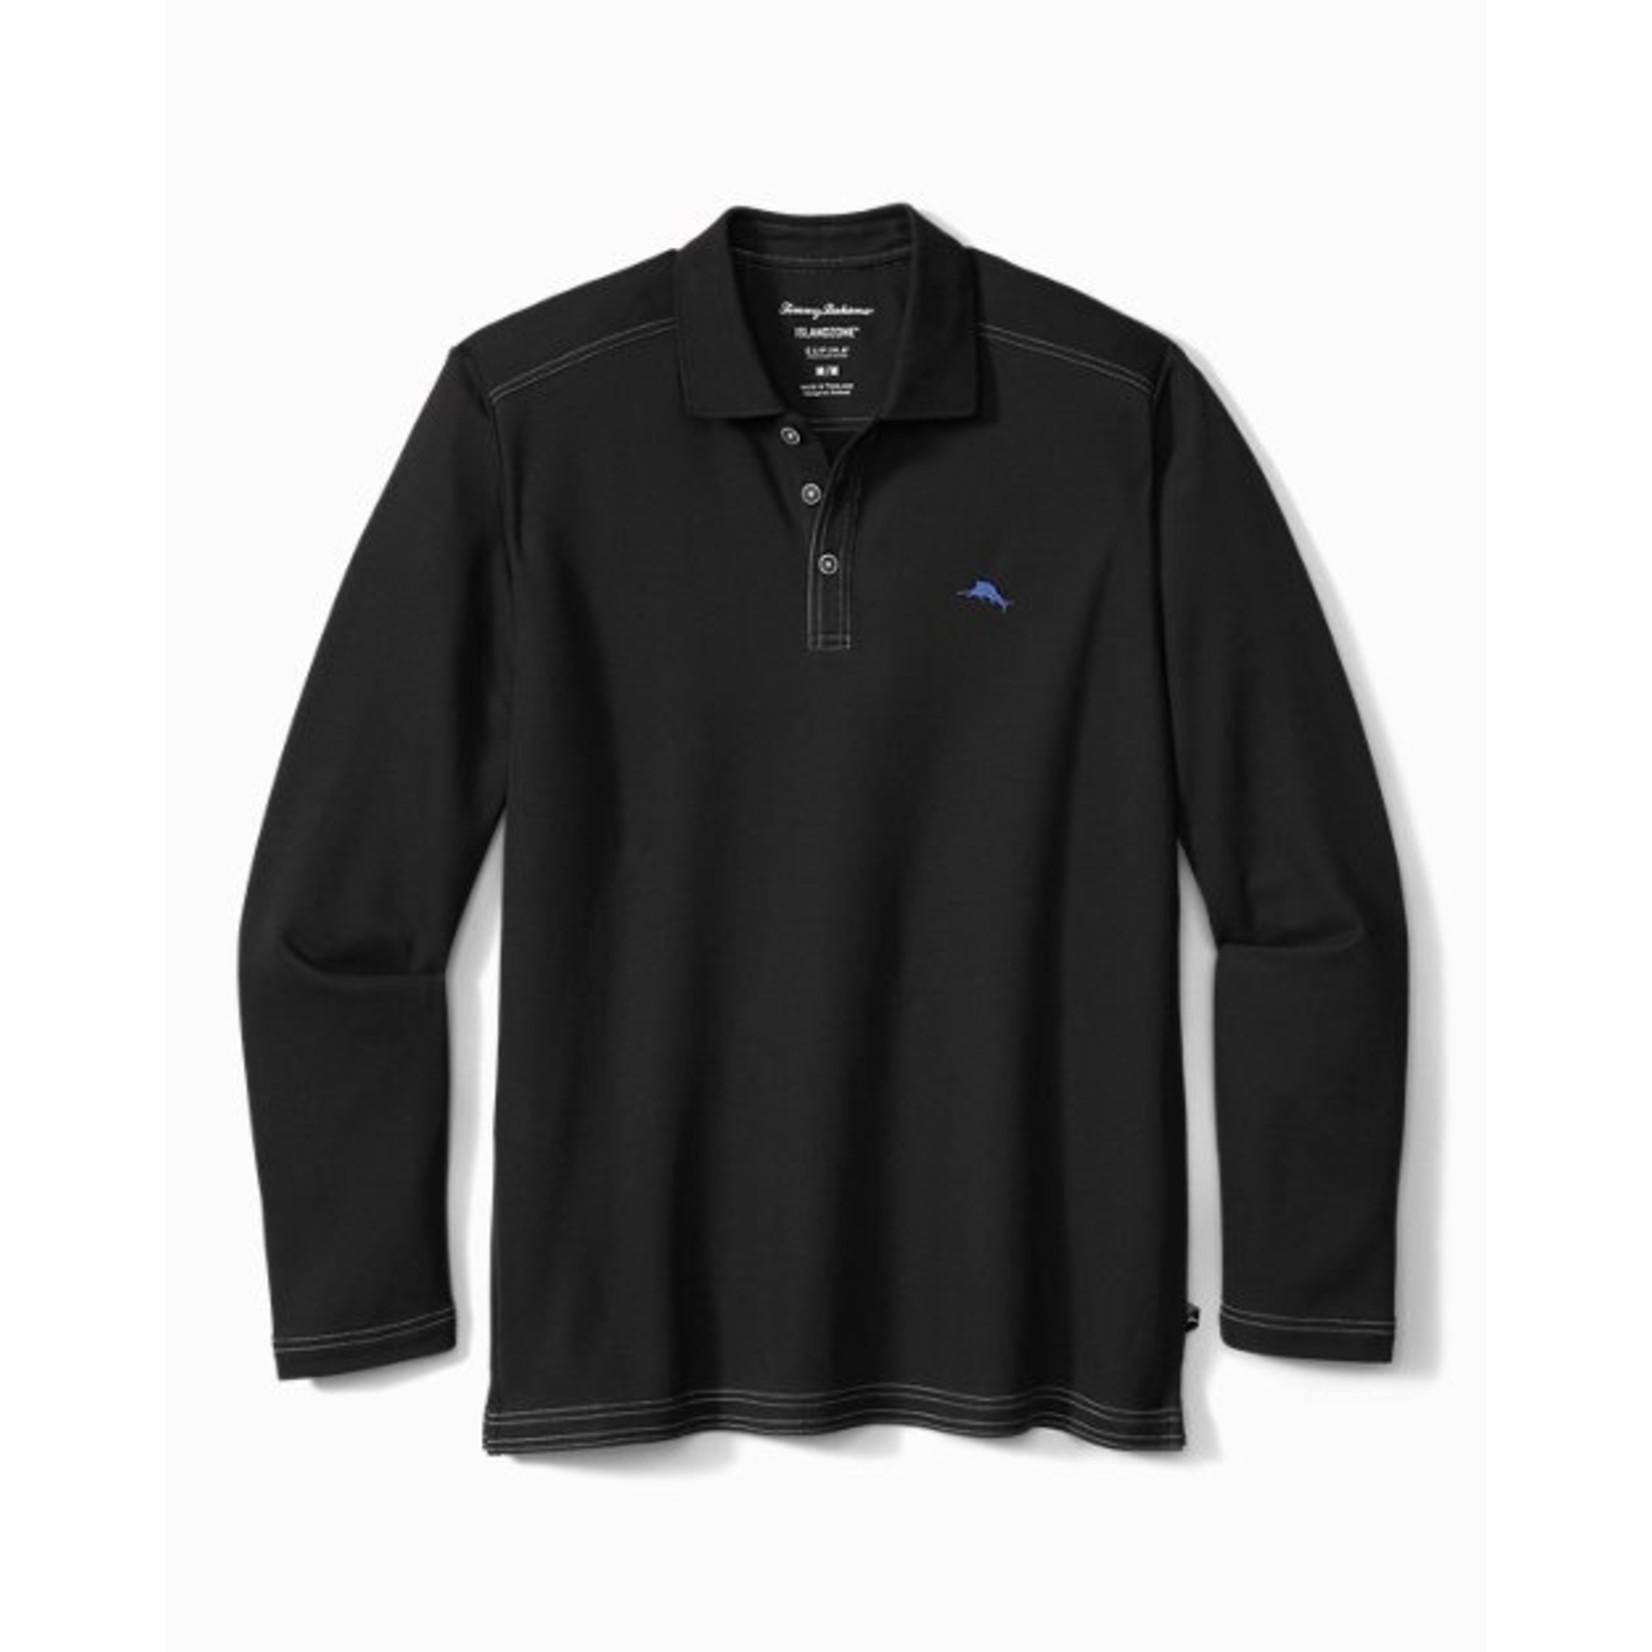 Tommy Bahama Tommy Bahama ST225517 Long-Sleeve Emfielder 2.0 Polo - 023 Black